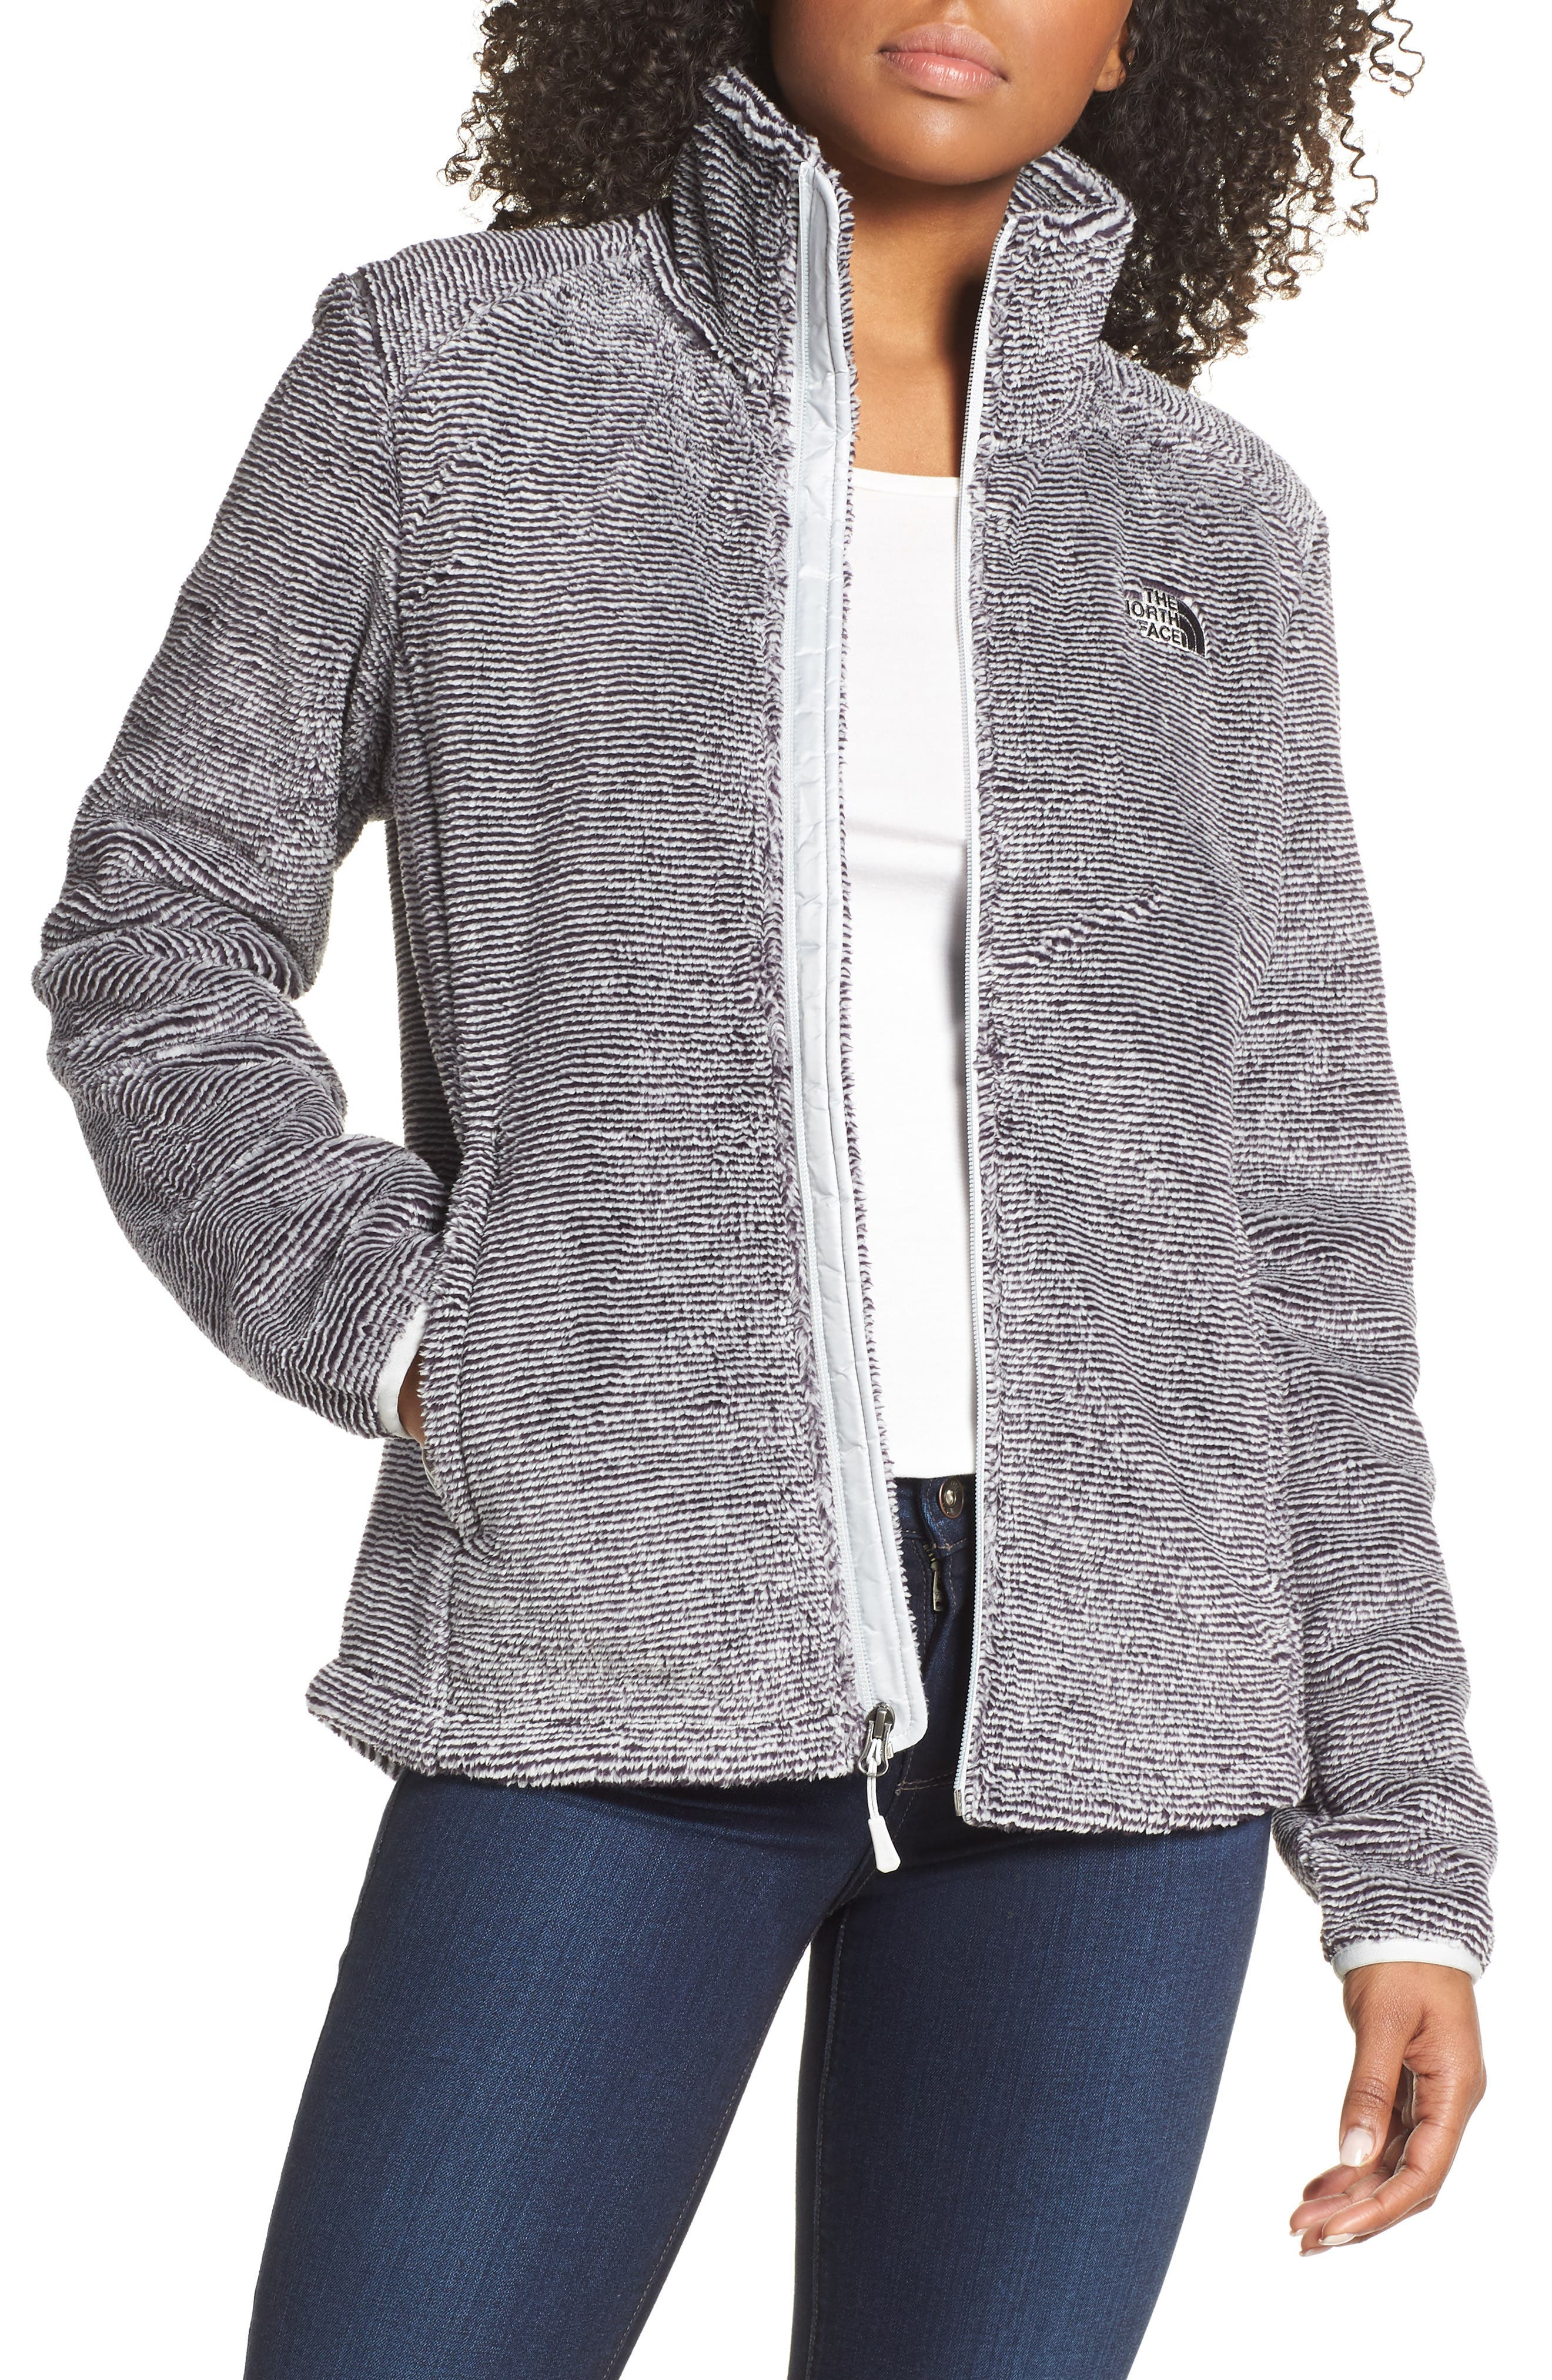 THE NORTH FACE, Osito 2 Stripe Fleece Jacket, Main thumbnail 1, color, BLACK/ TIN GREY STRIPE